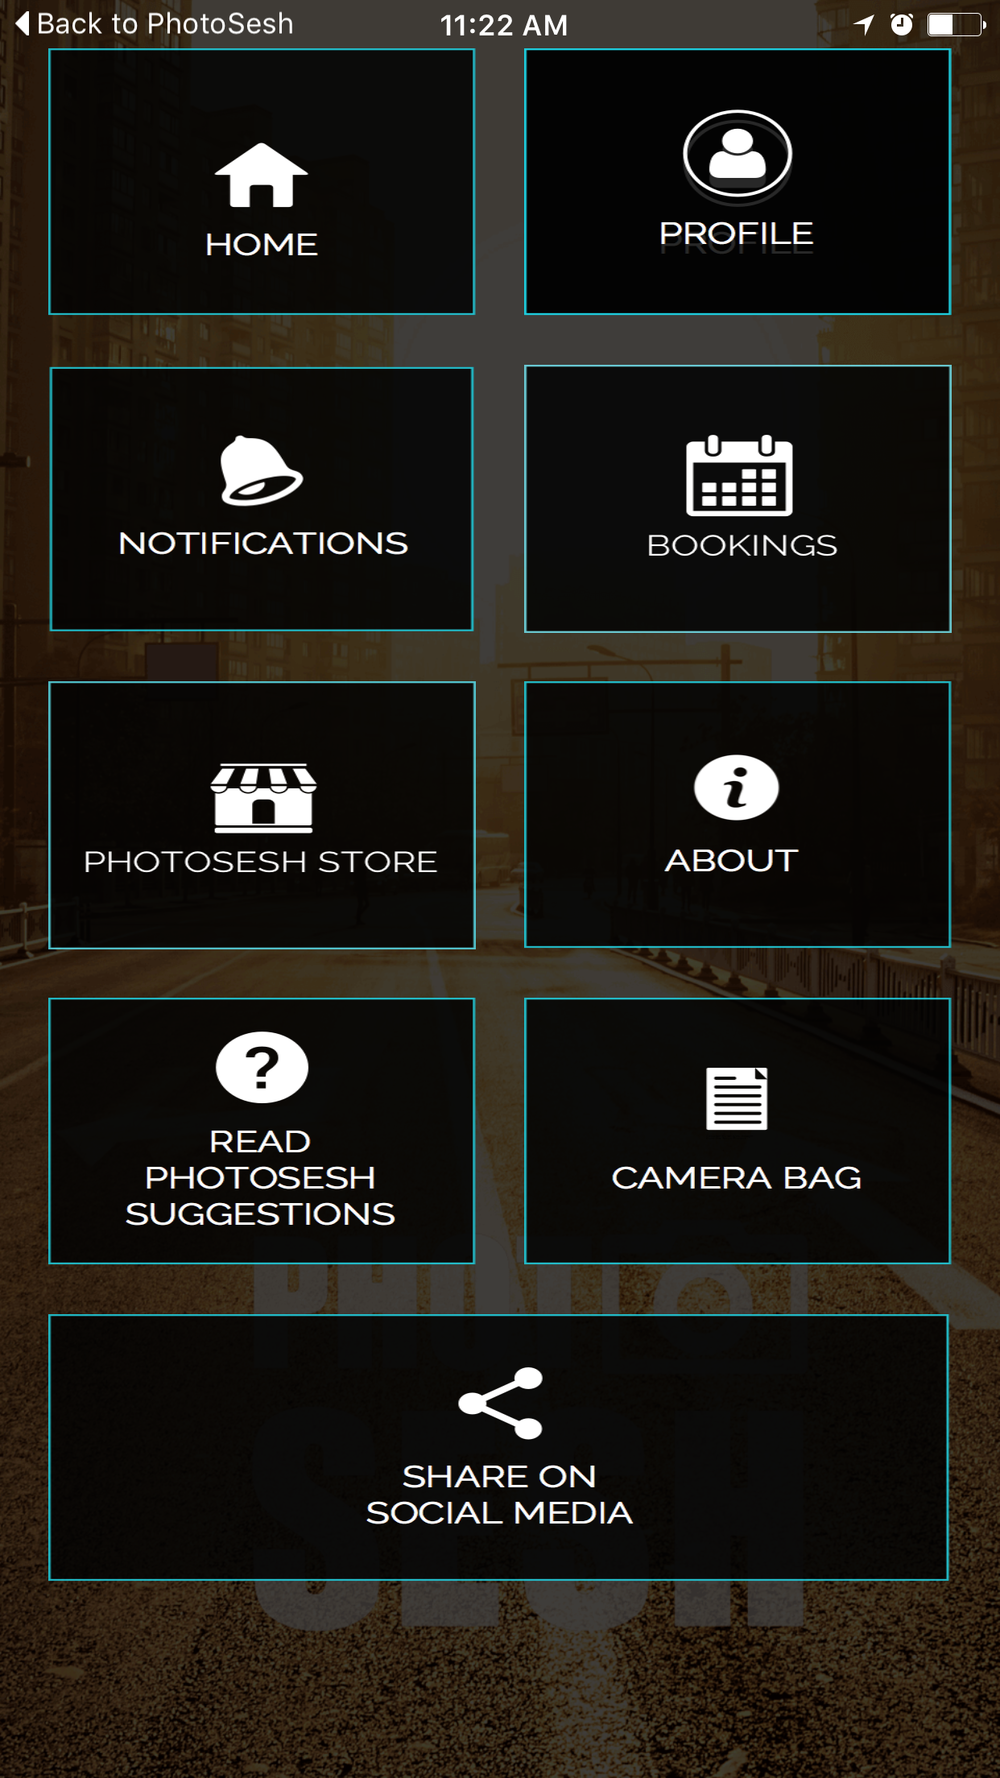 SP Appstore Screenshot - 1.PNG